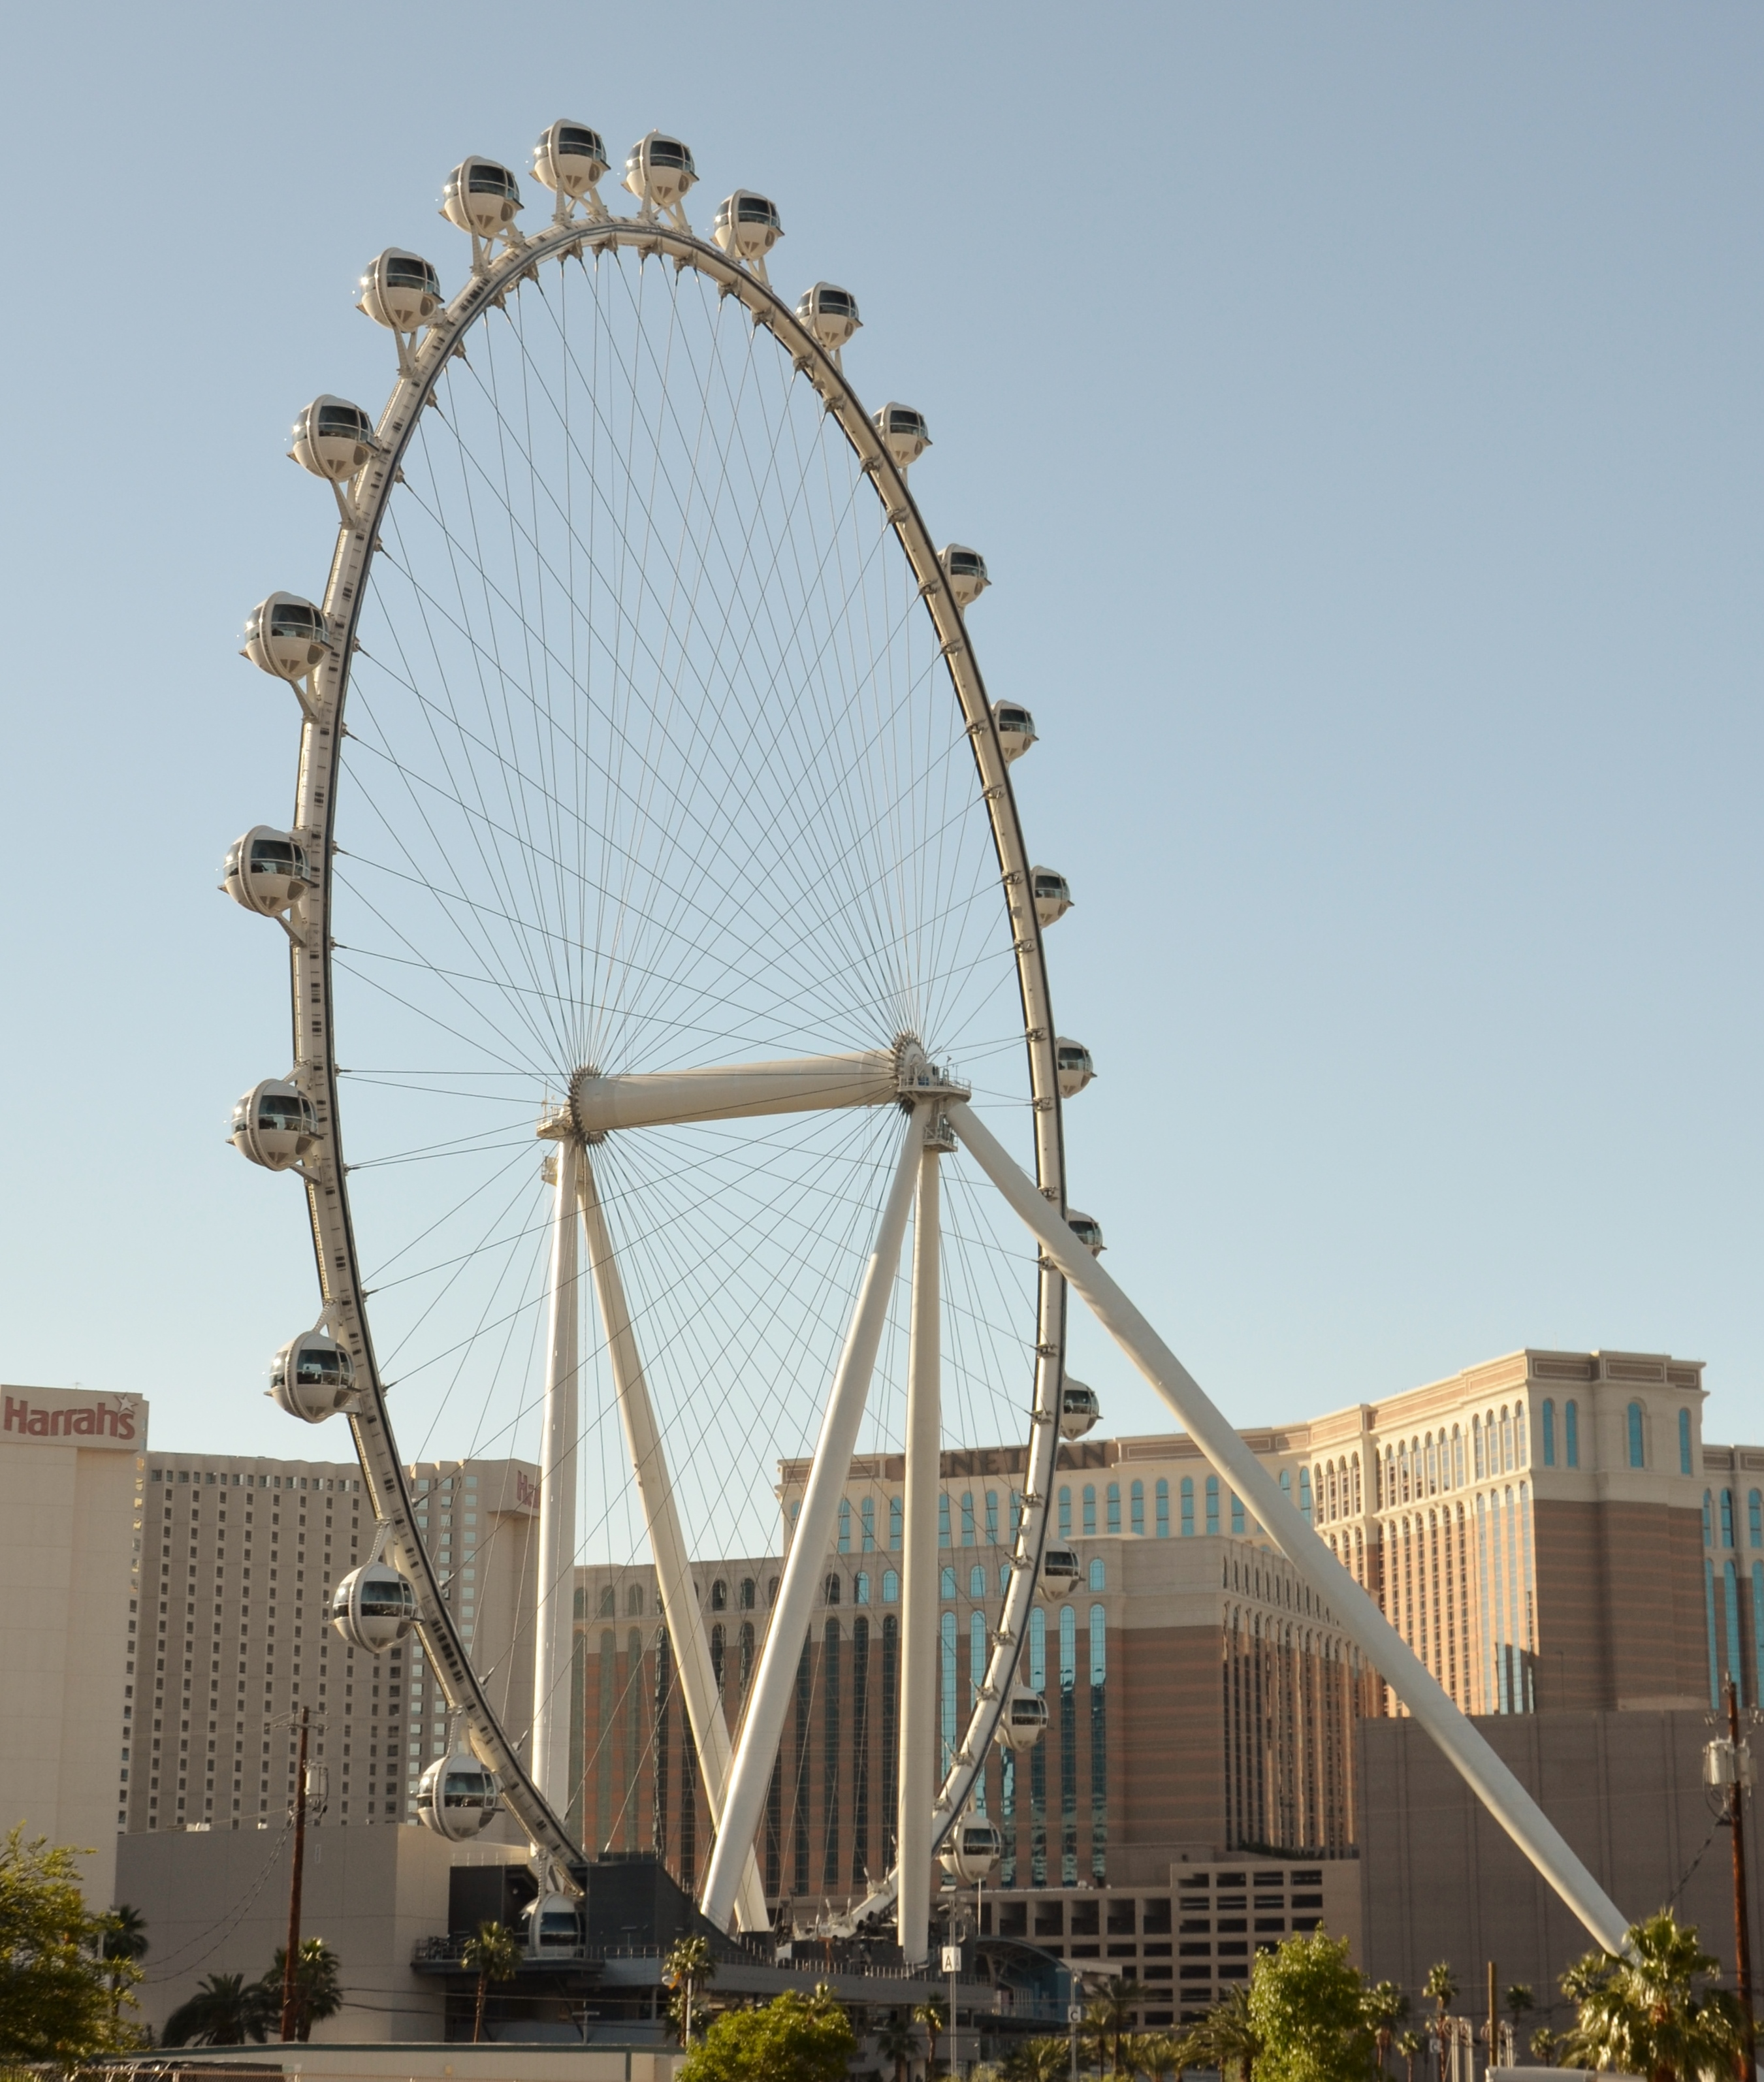 Ferris wheel - Wikipedia